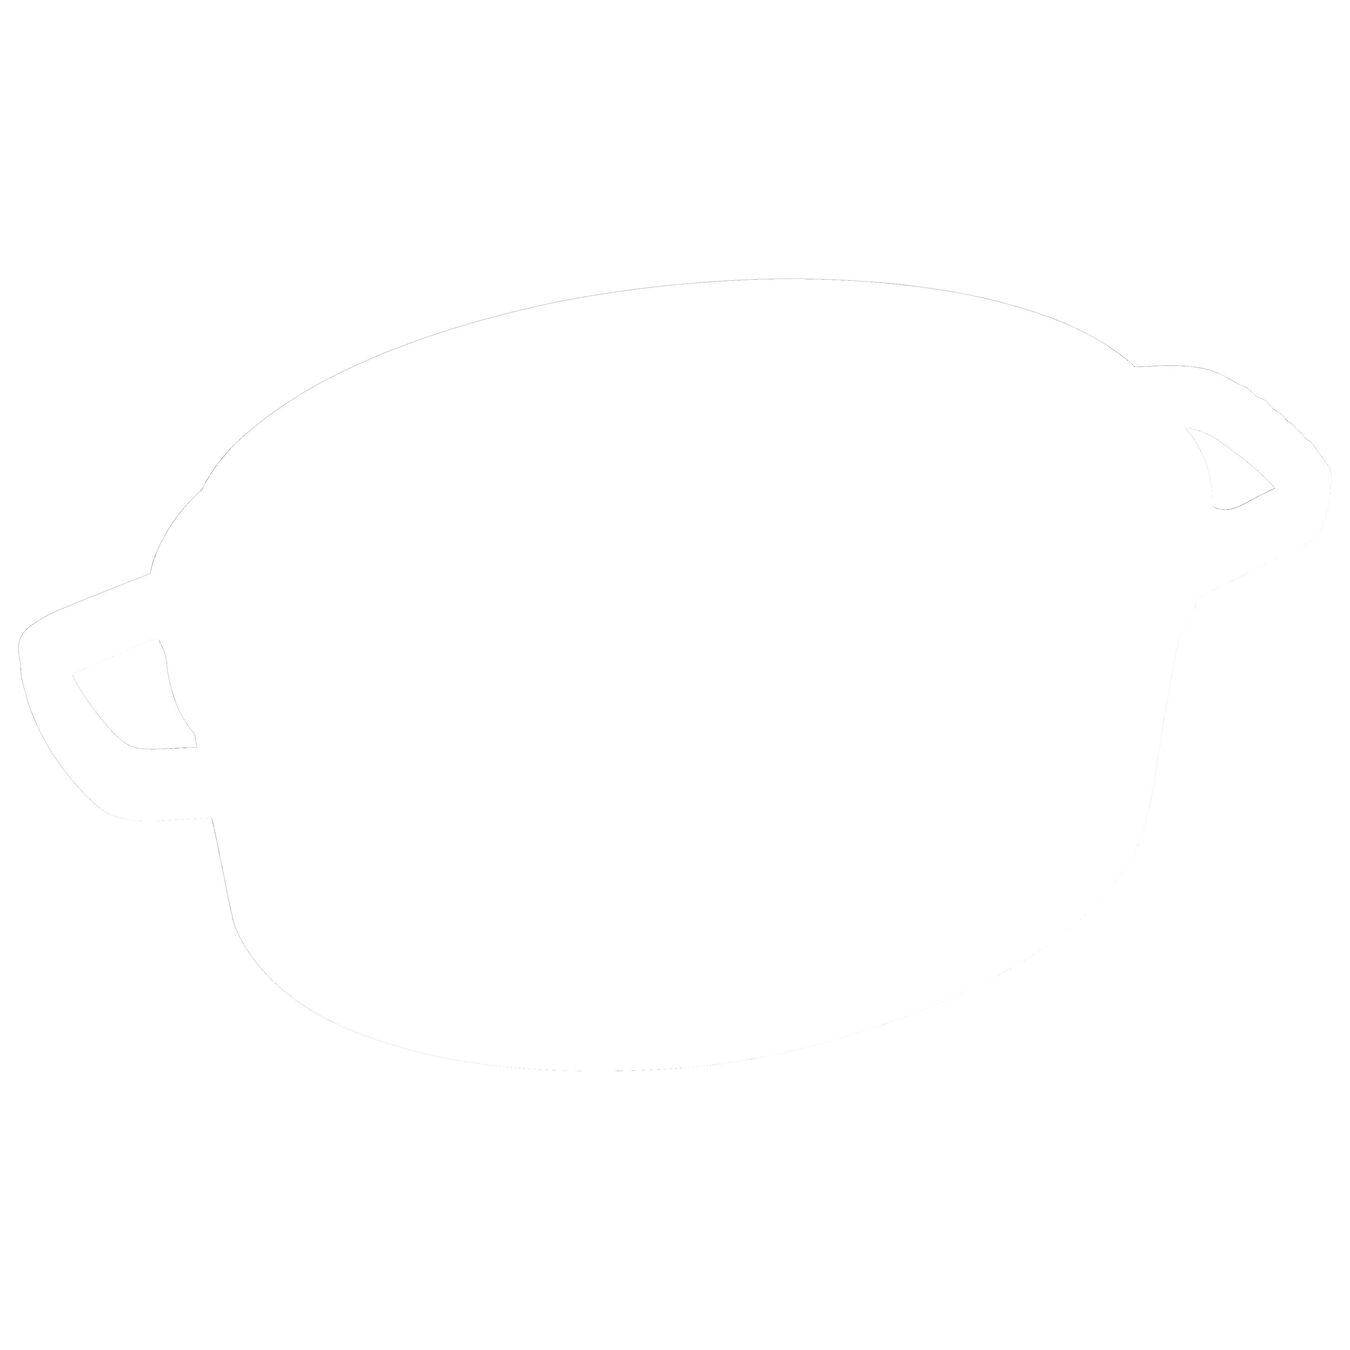 Cocotte 29 cm, Ovale, Cannelle, Fonte,,large 6